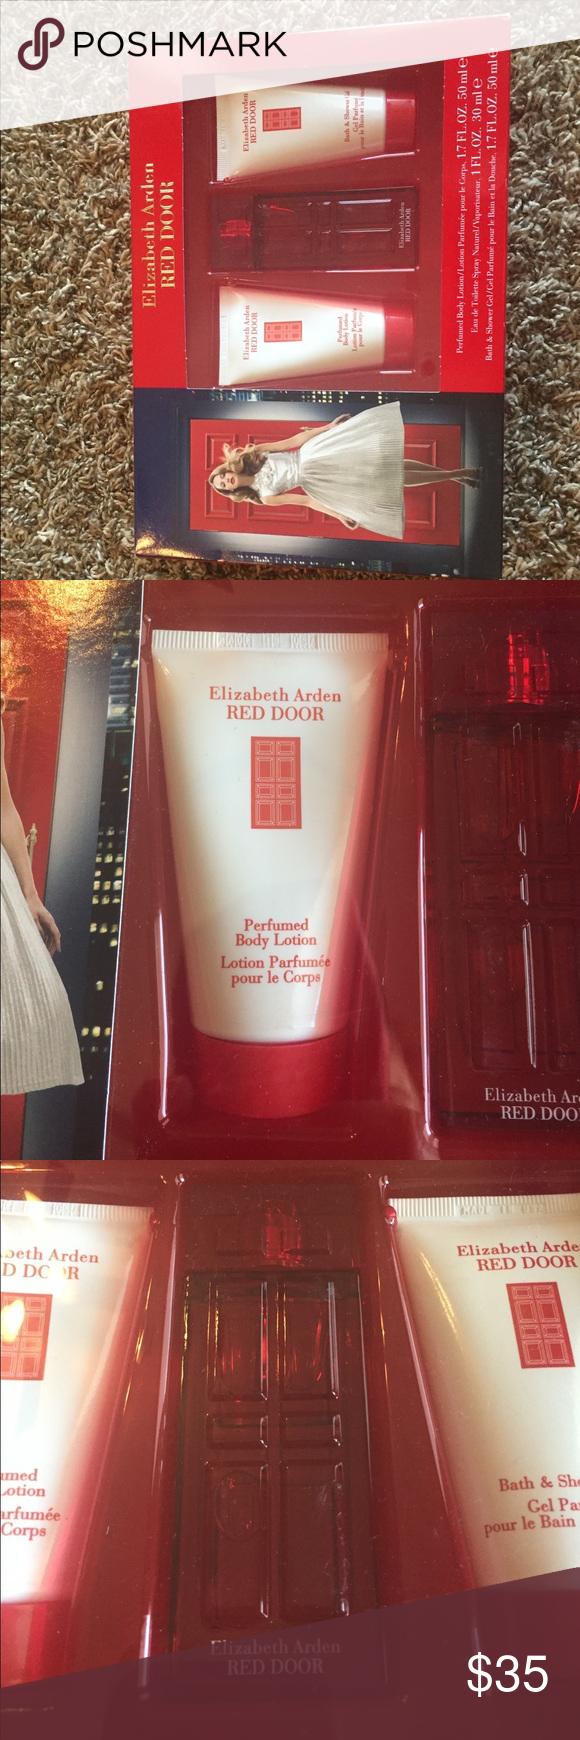 Red Door By Elizabeth Arden Perfume Set Never Opened Brand New Red